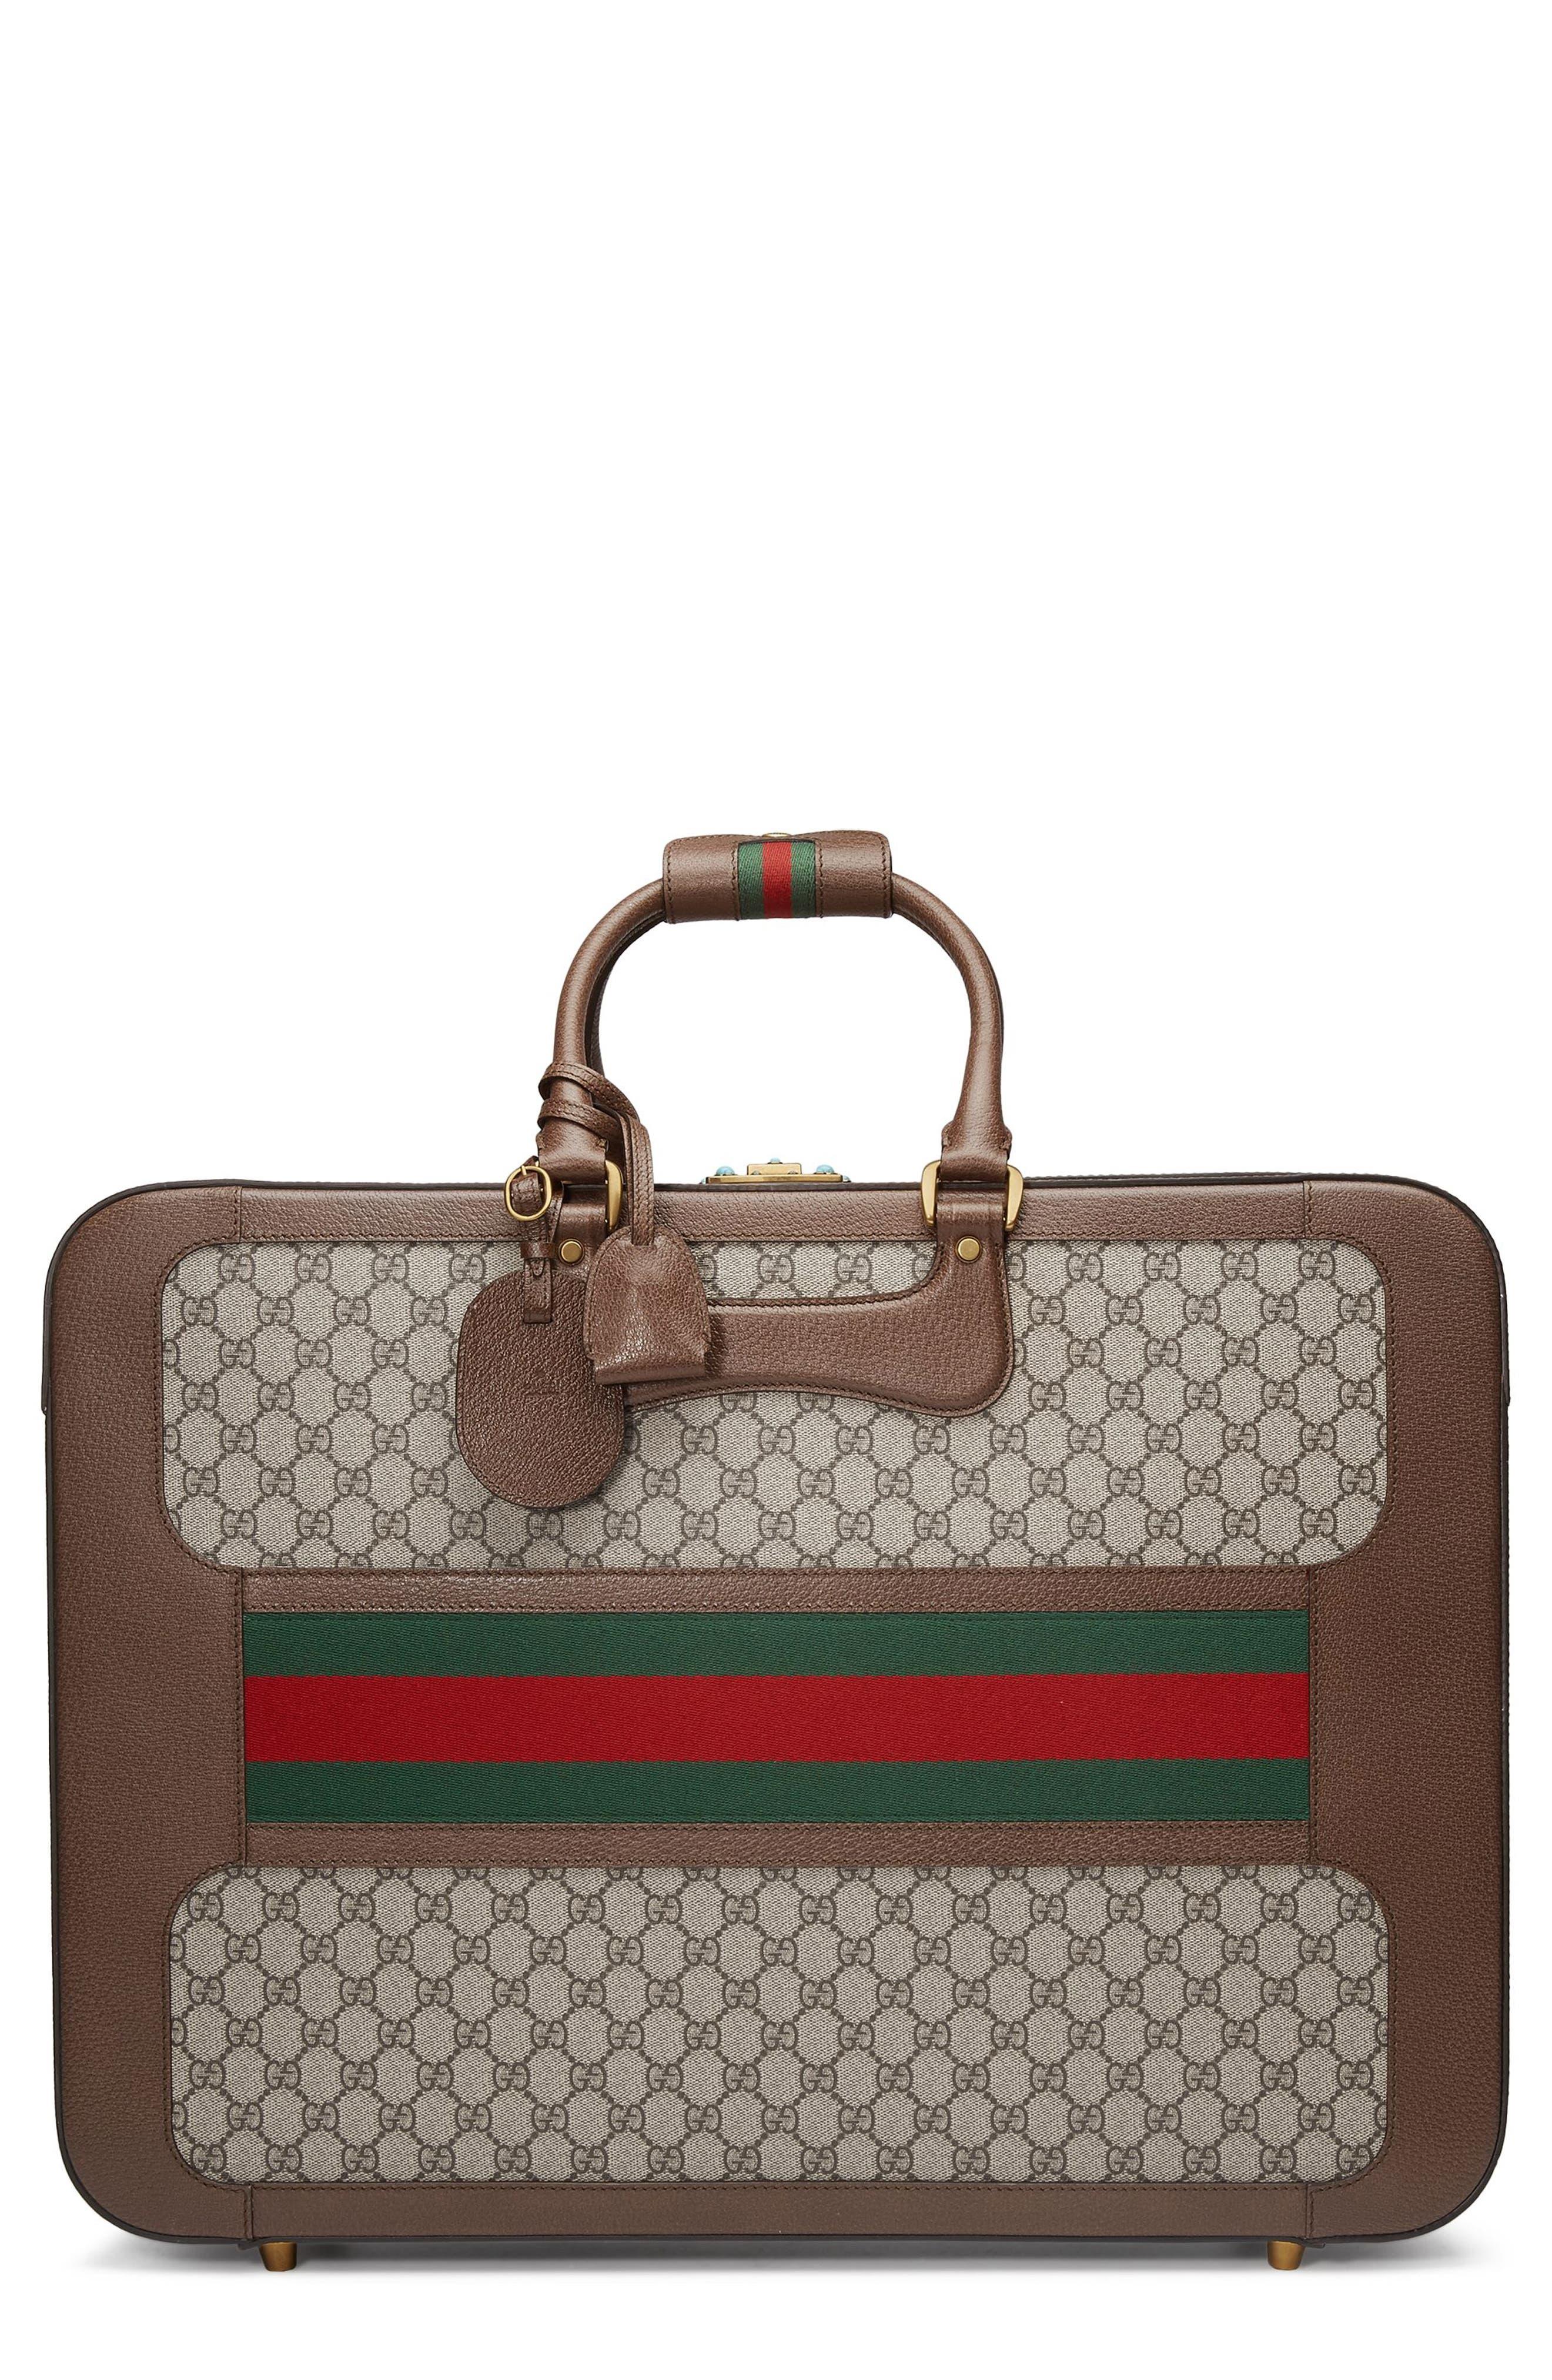 Large Echo GG Supreme Canvas & Leather Suitcase,                         Main,                         color, Beige/ Ebony